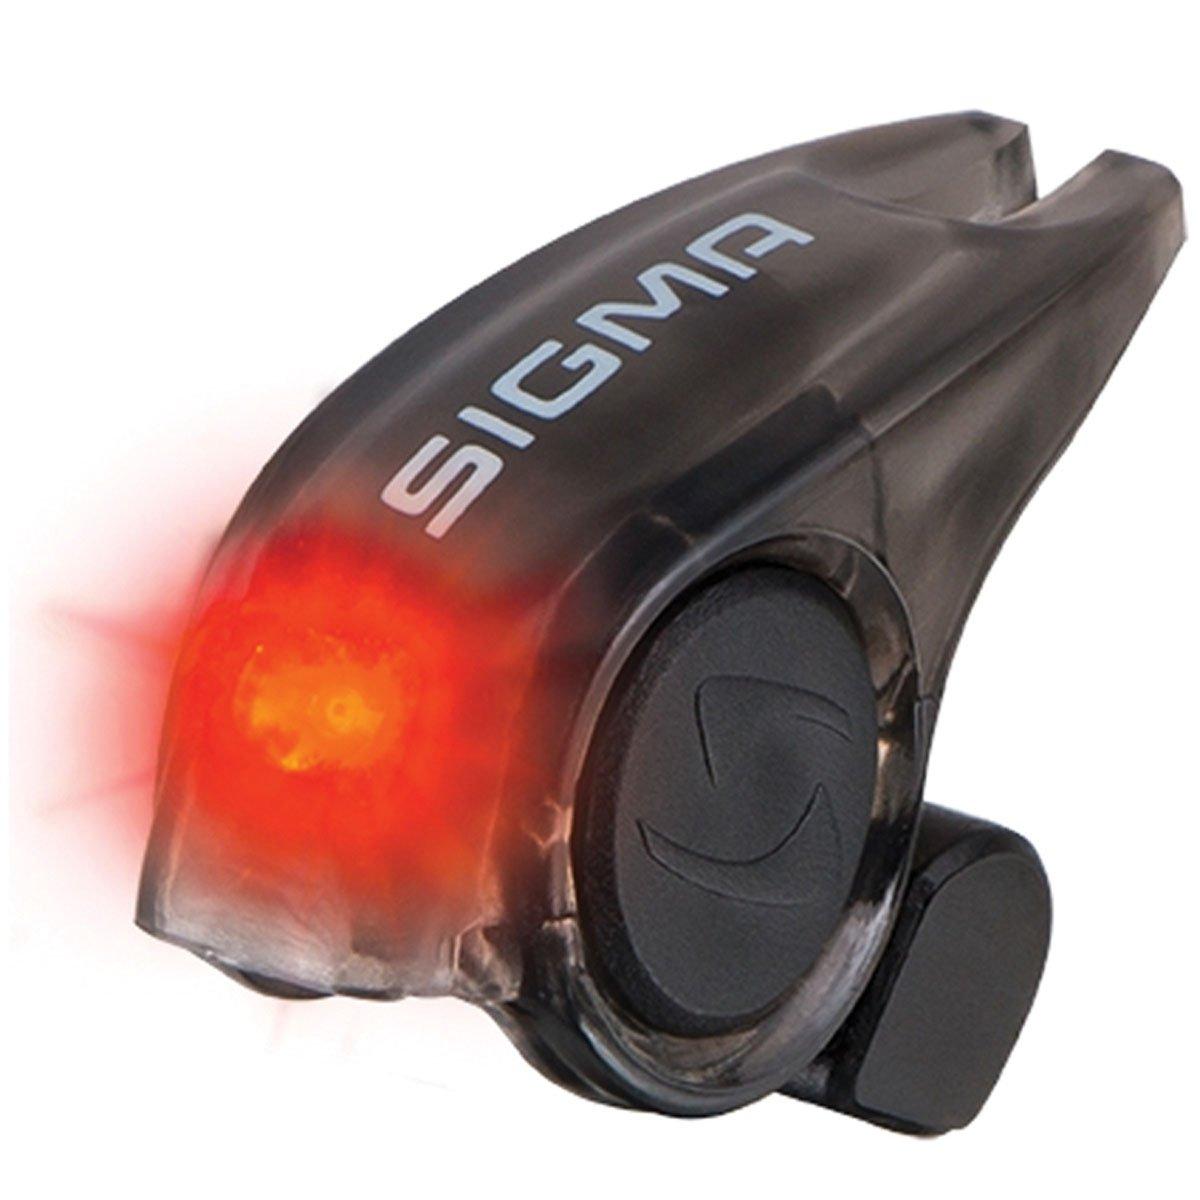 Sigma Brake Light Black Image 1